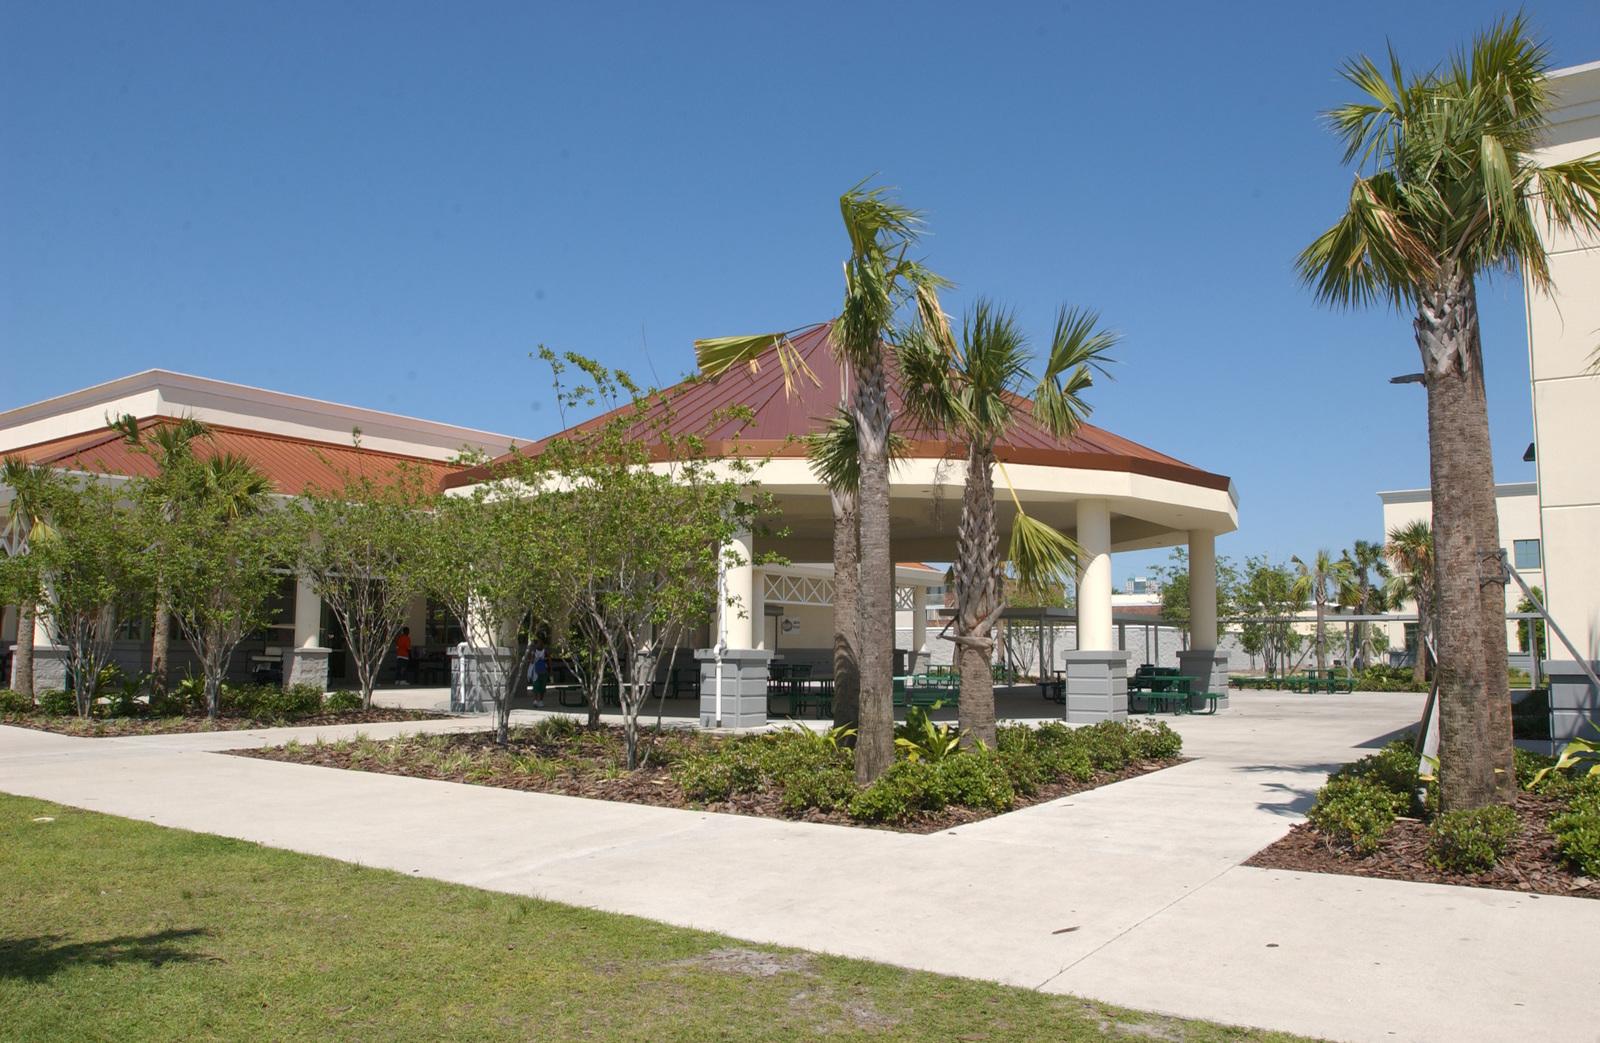 [Highlights from] Orlando, Florida:  [City scenes,] housing construction, new homes, Jones High School